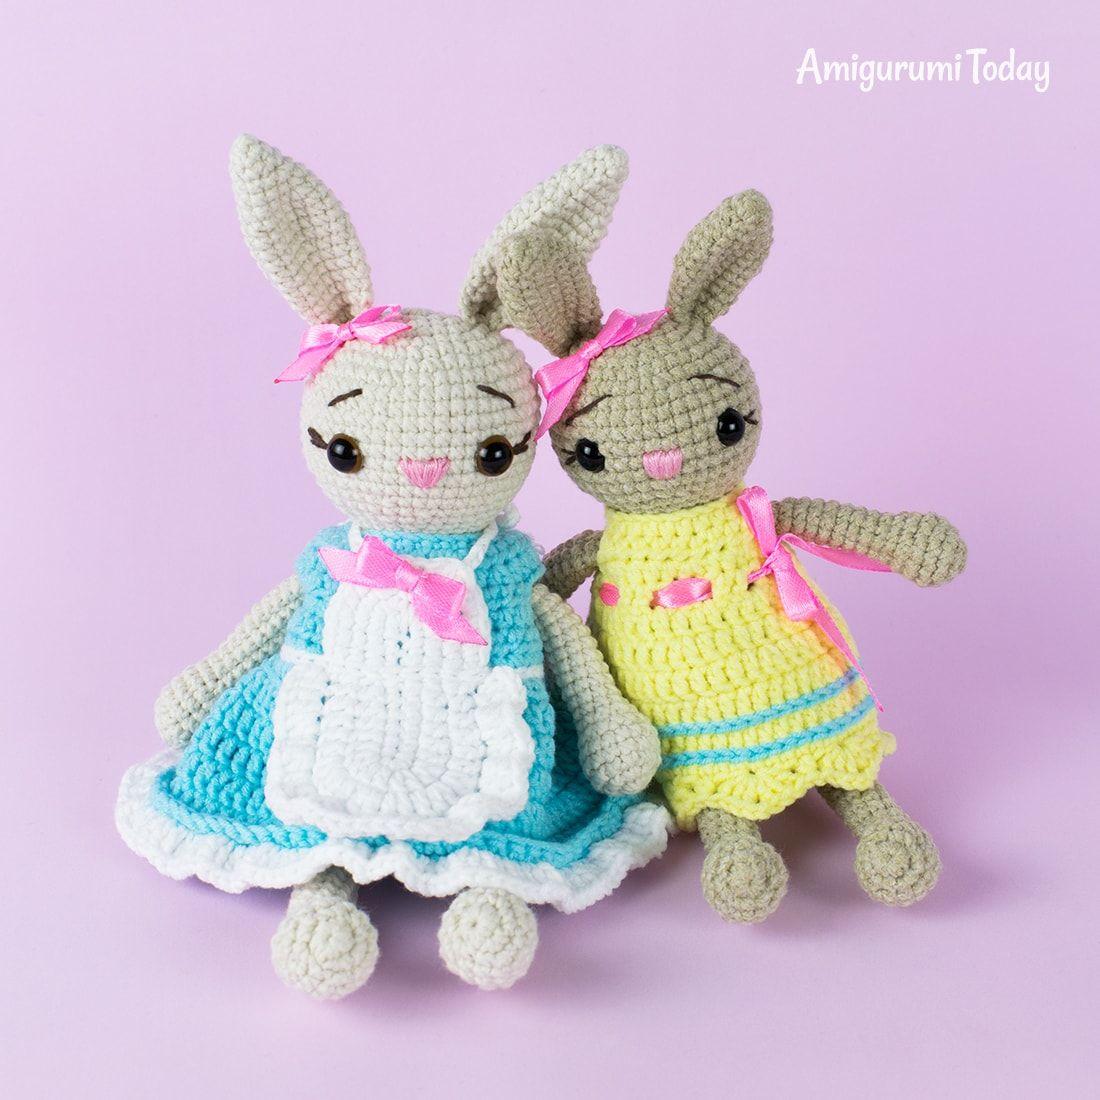 Sunny Bunny crochet pattern - Amigurumi Today | 1100x1100